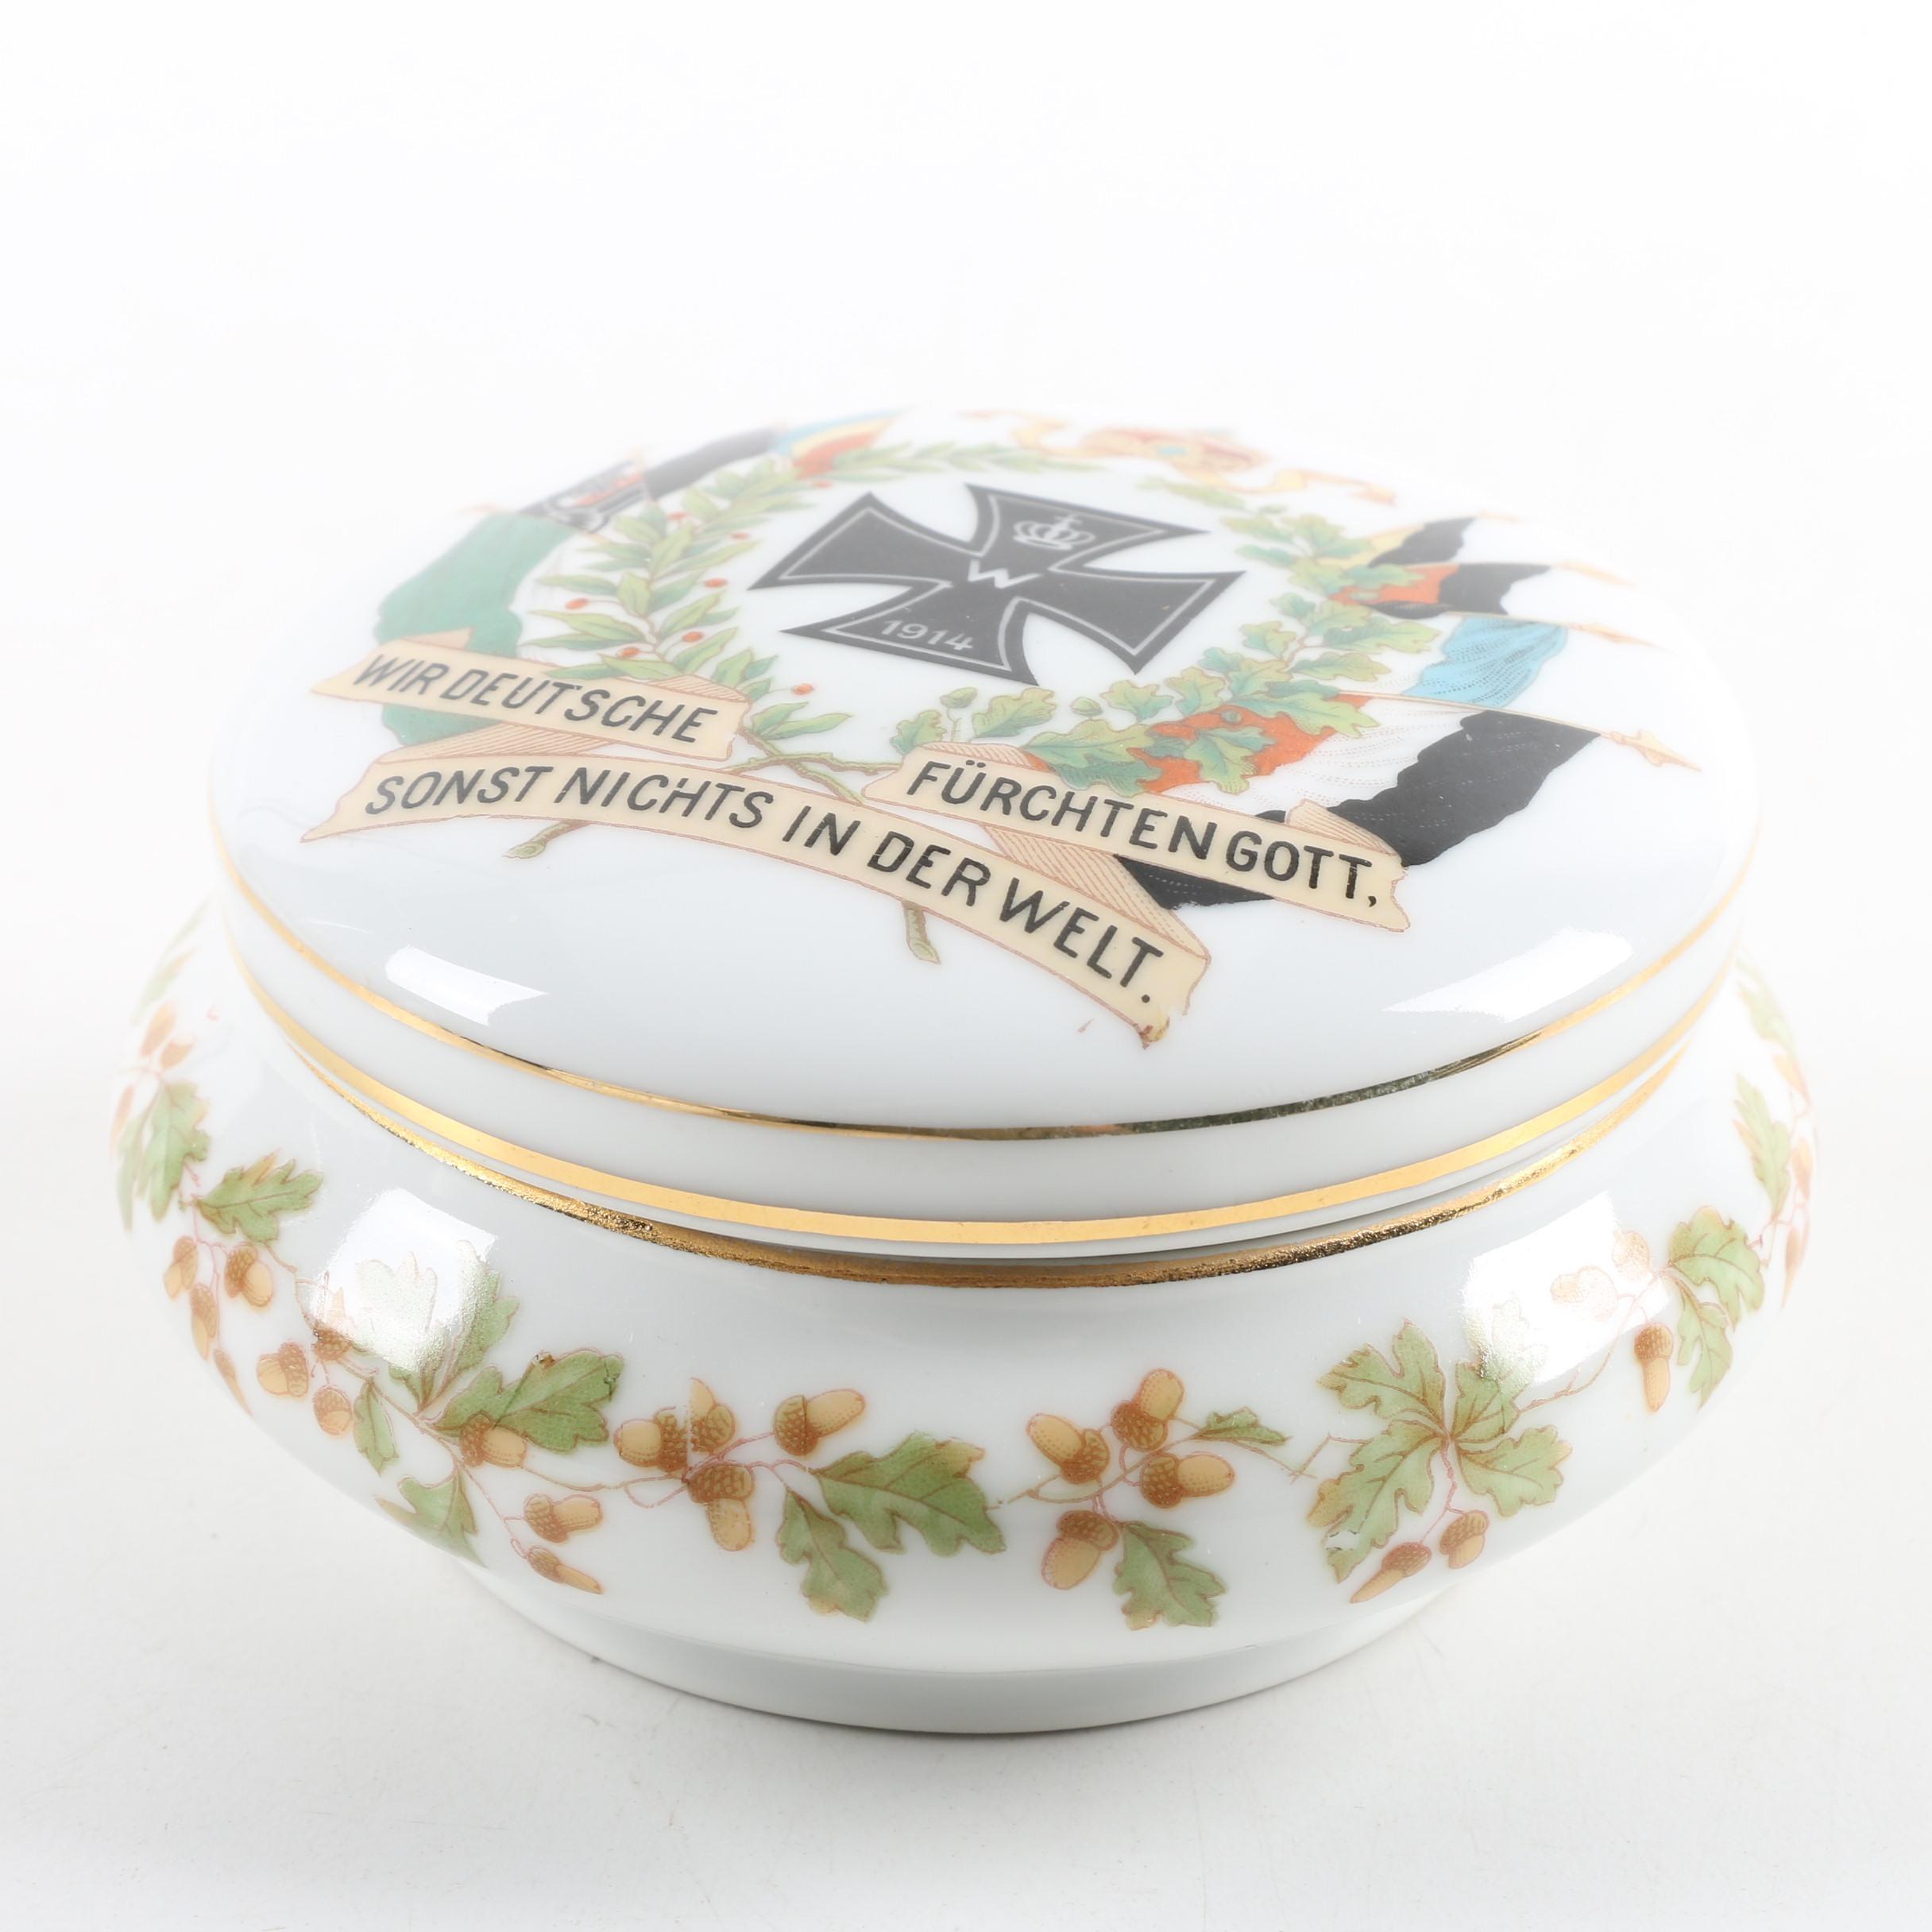 Antique Z. S. & Co. Bavarian WWI Military Themed Porcelain Trinket Box